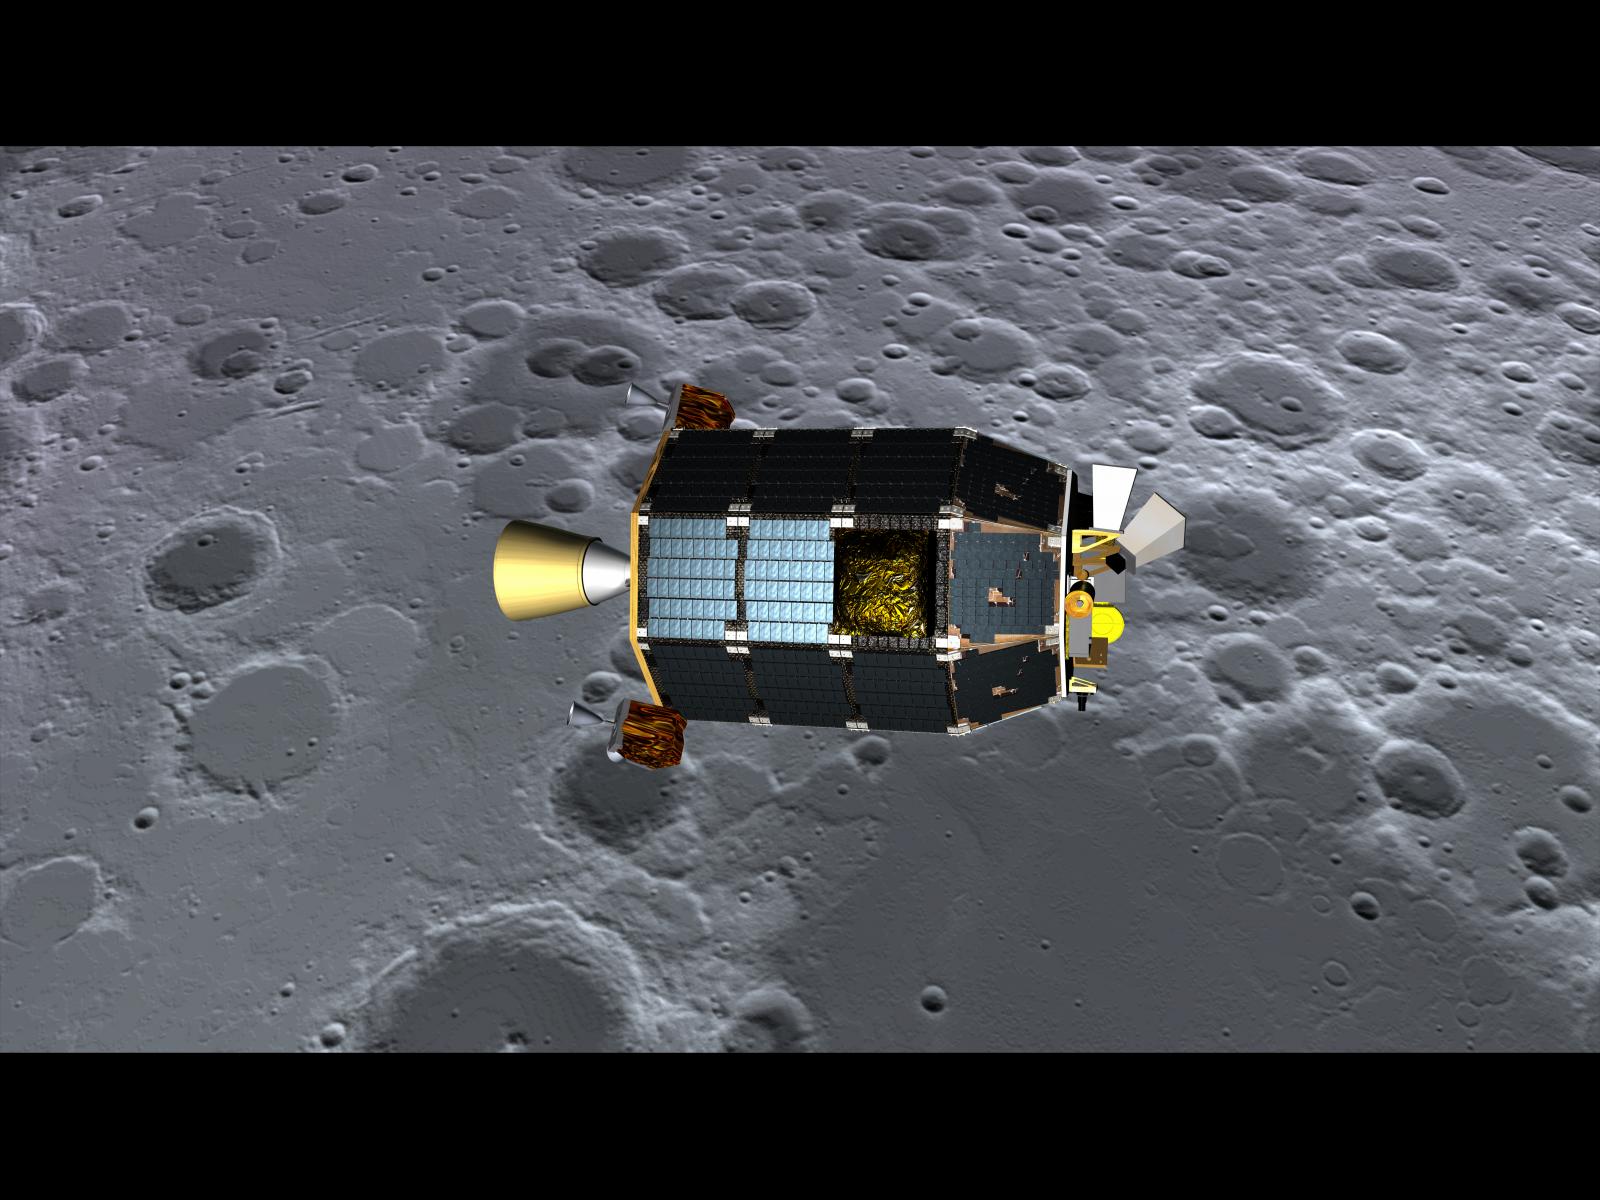 NASA's LADEE Spacecraft Set to Crash Land on the Moon